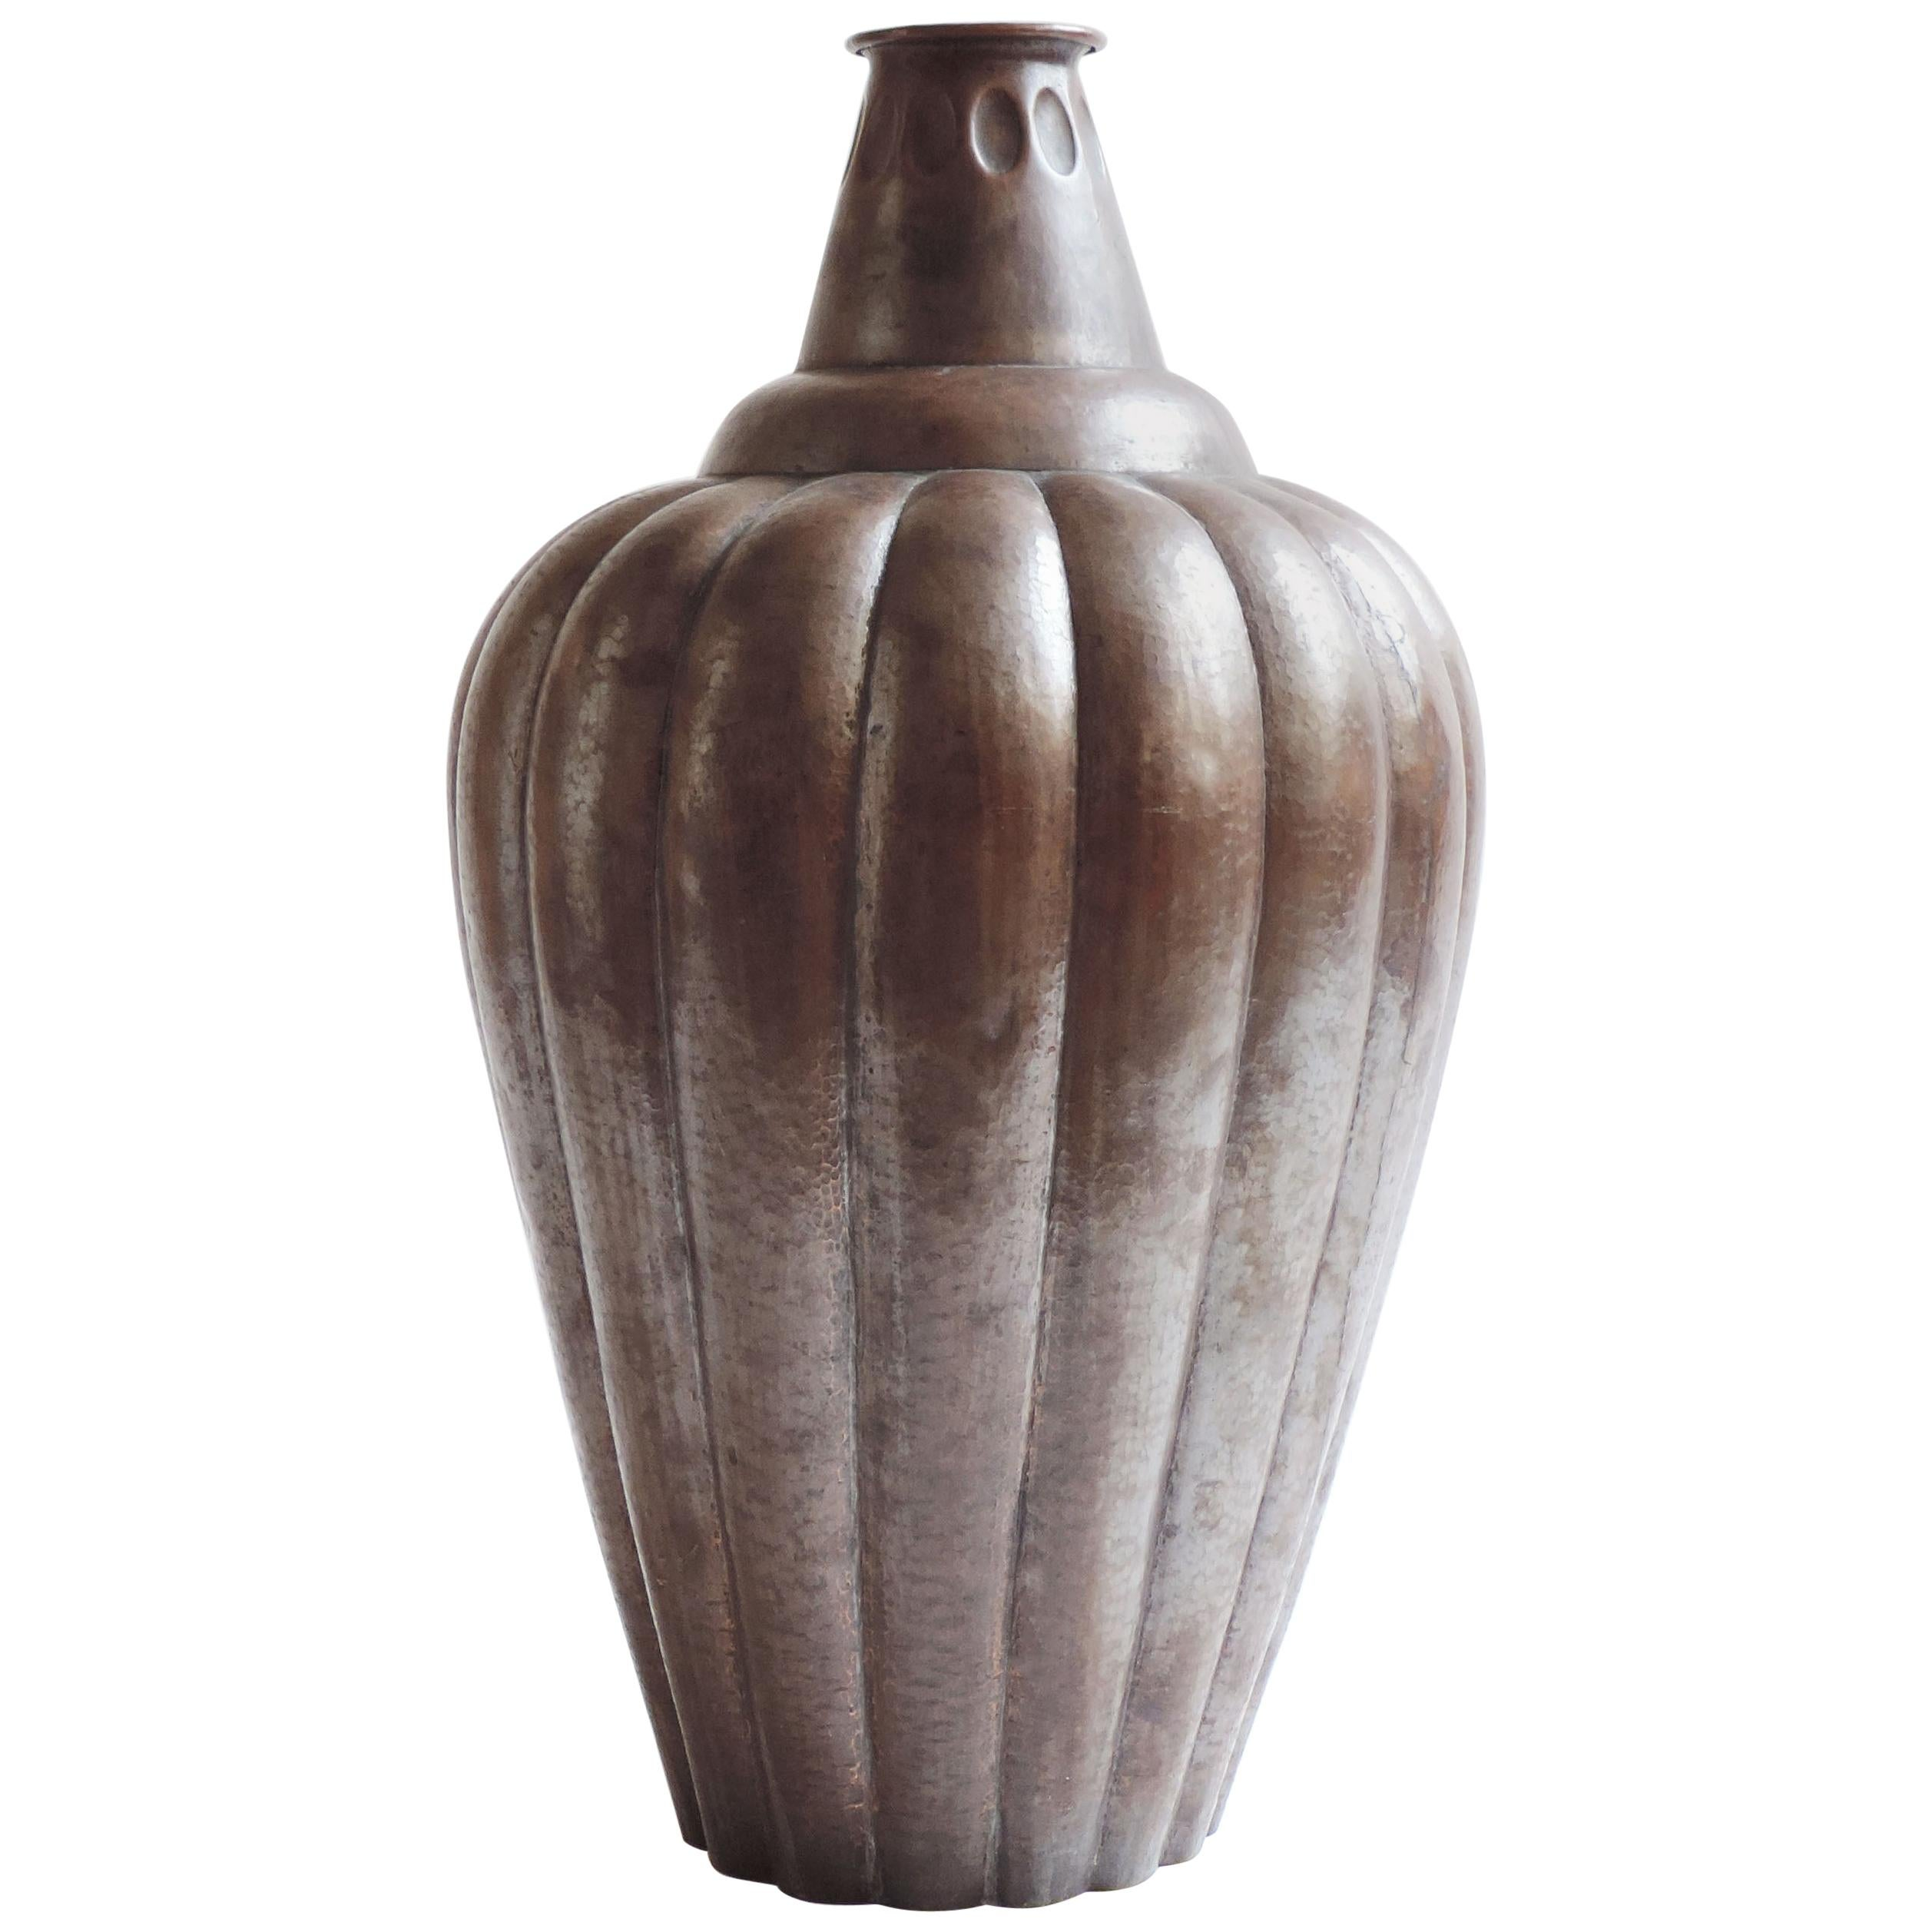 Monumental Vittorio Zecchin Hammered Copper Vase, Italy, 1925